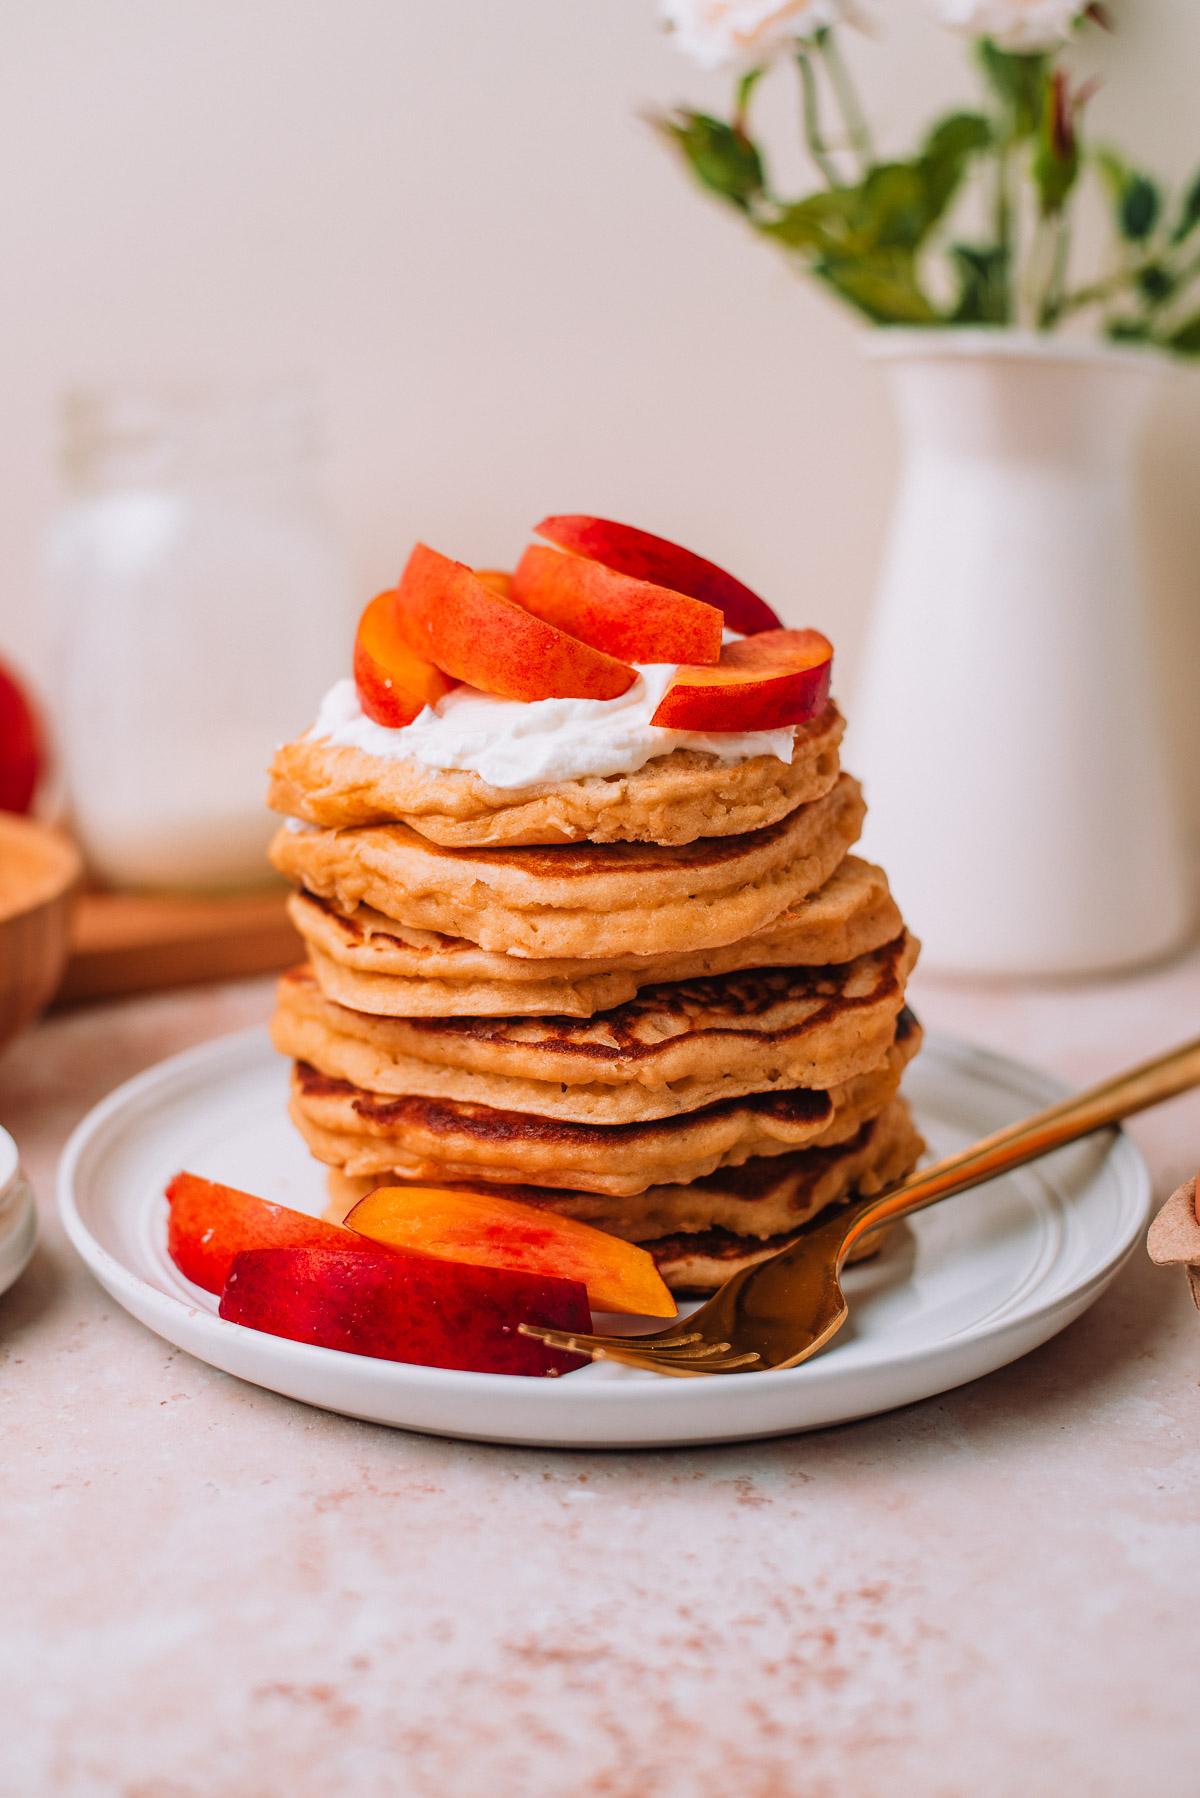 Whole Wheat Pancakes with Yogurt and Nectarines